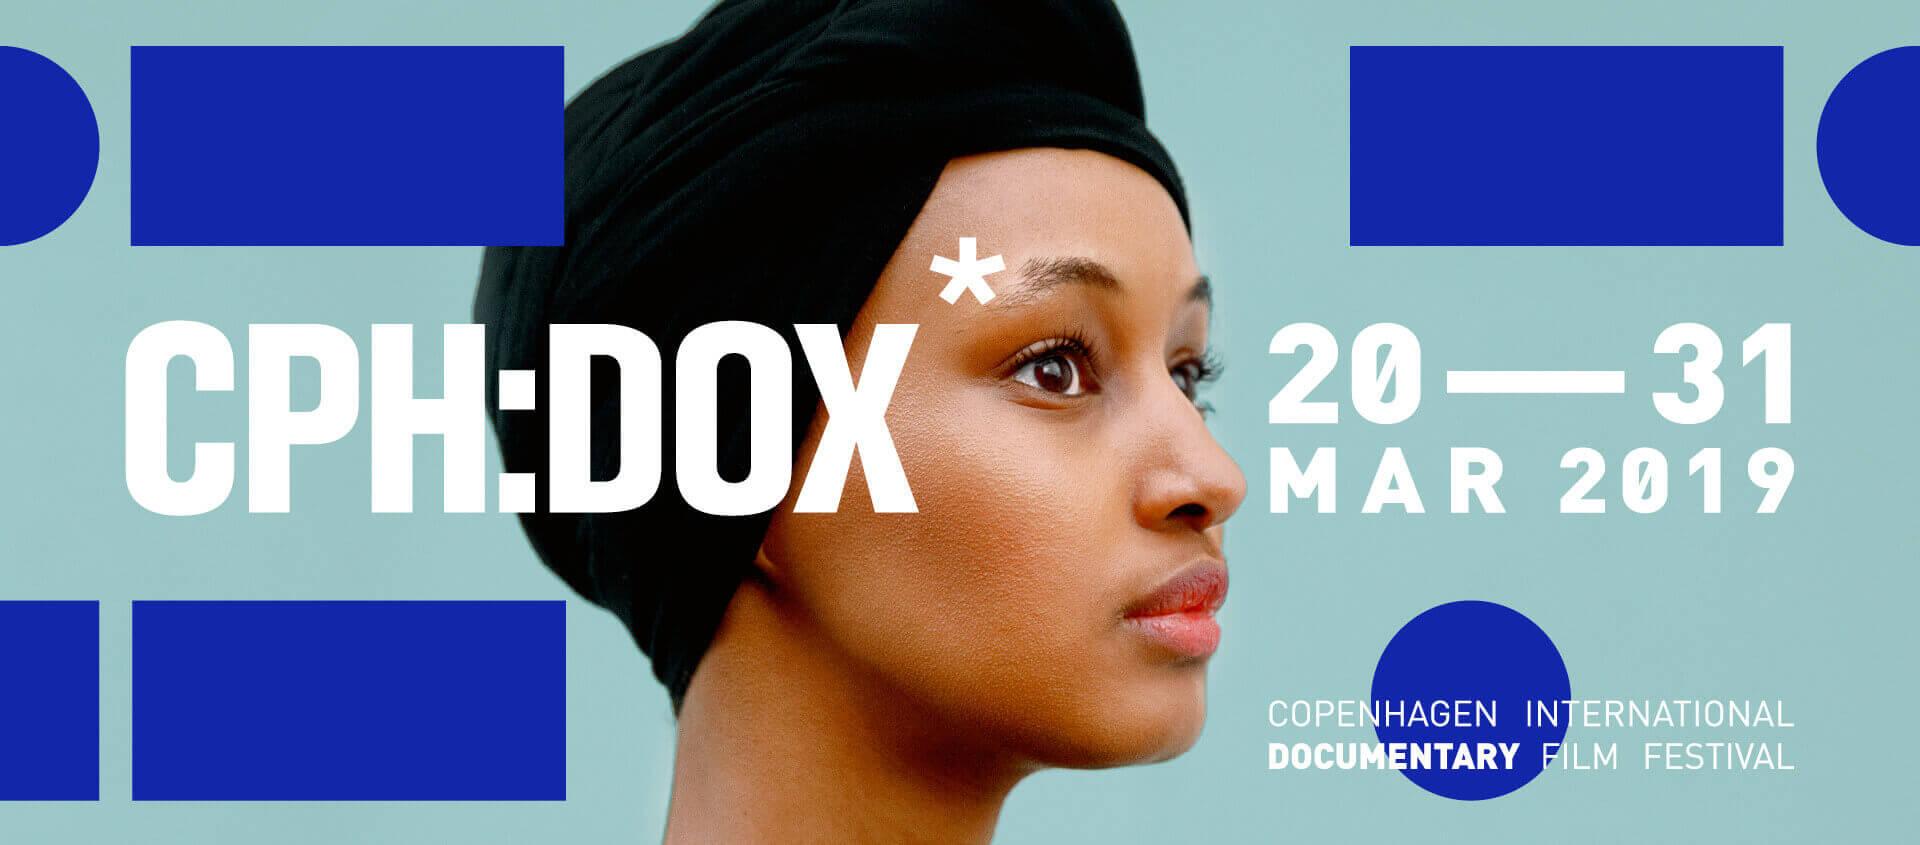 IMS at CPH:DOX documentary film festival 2019